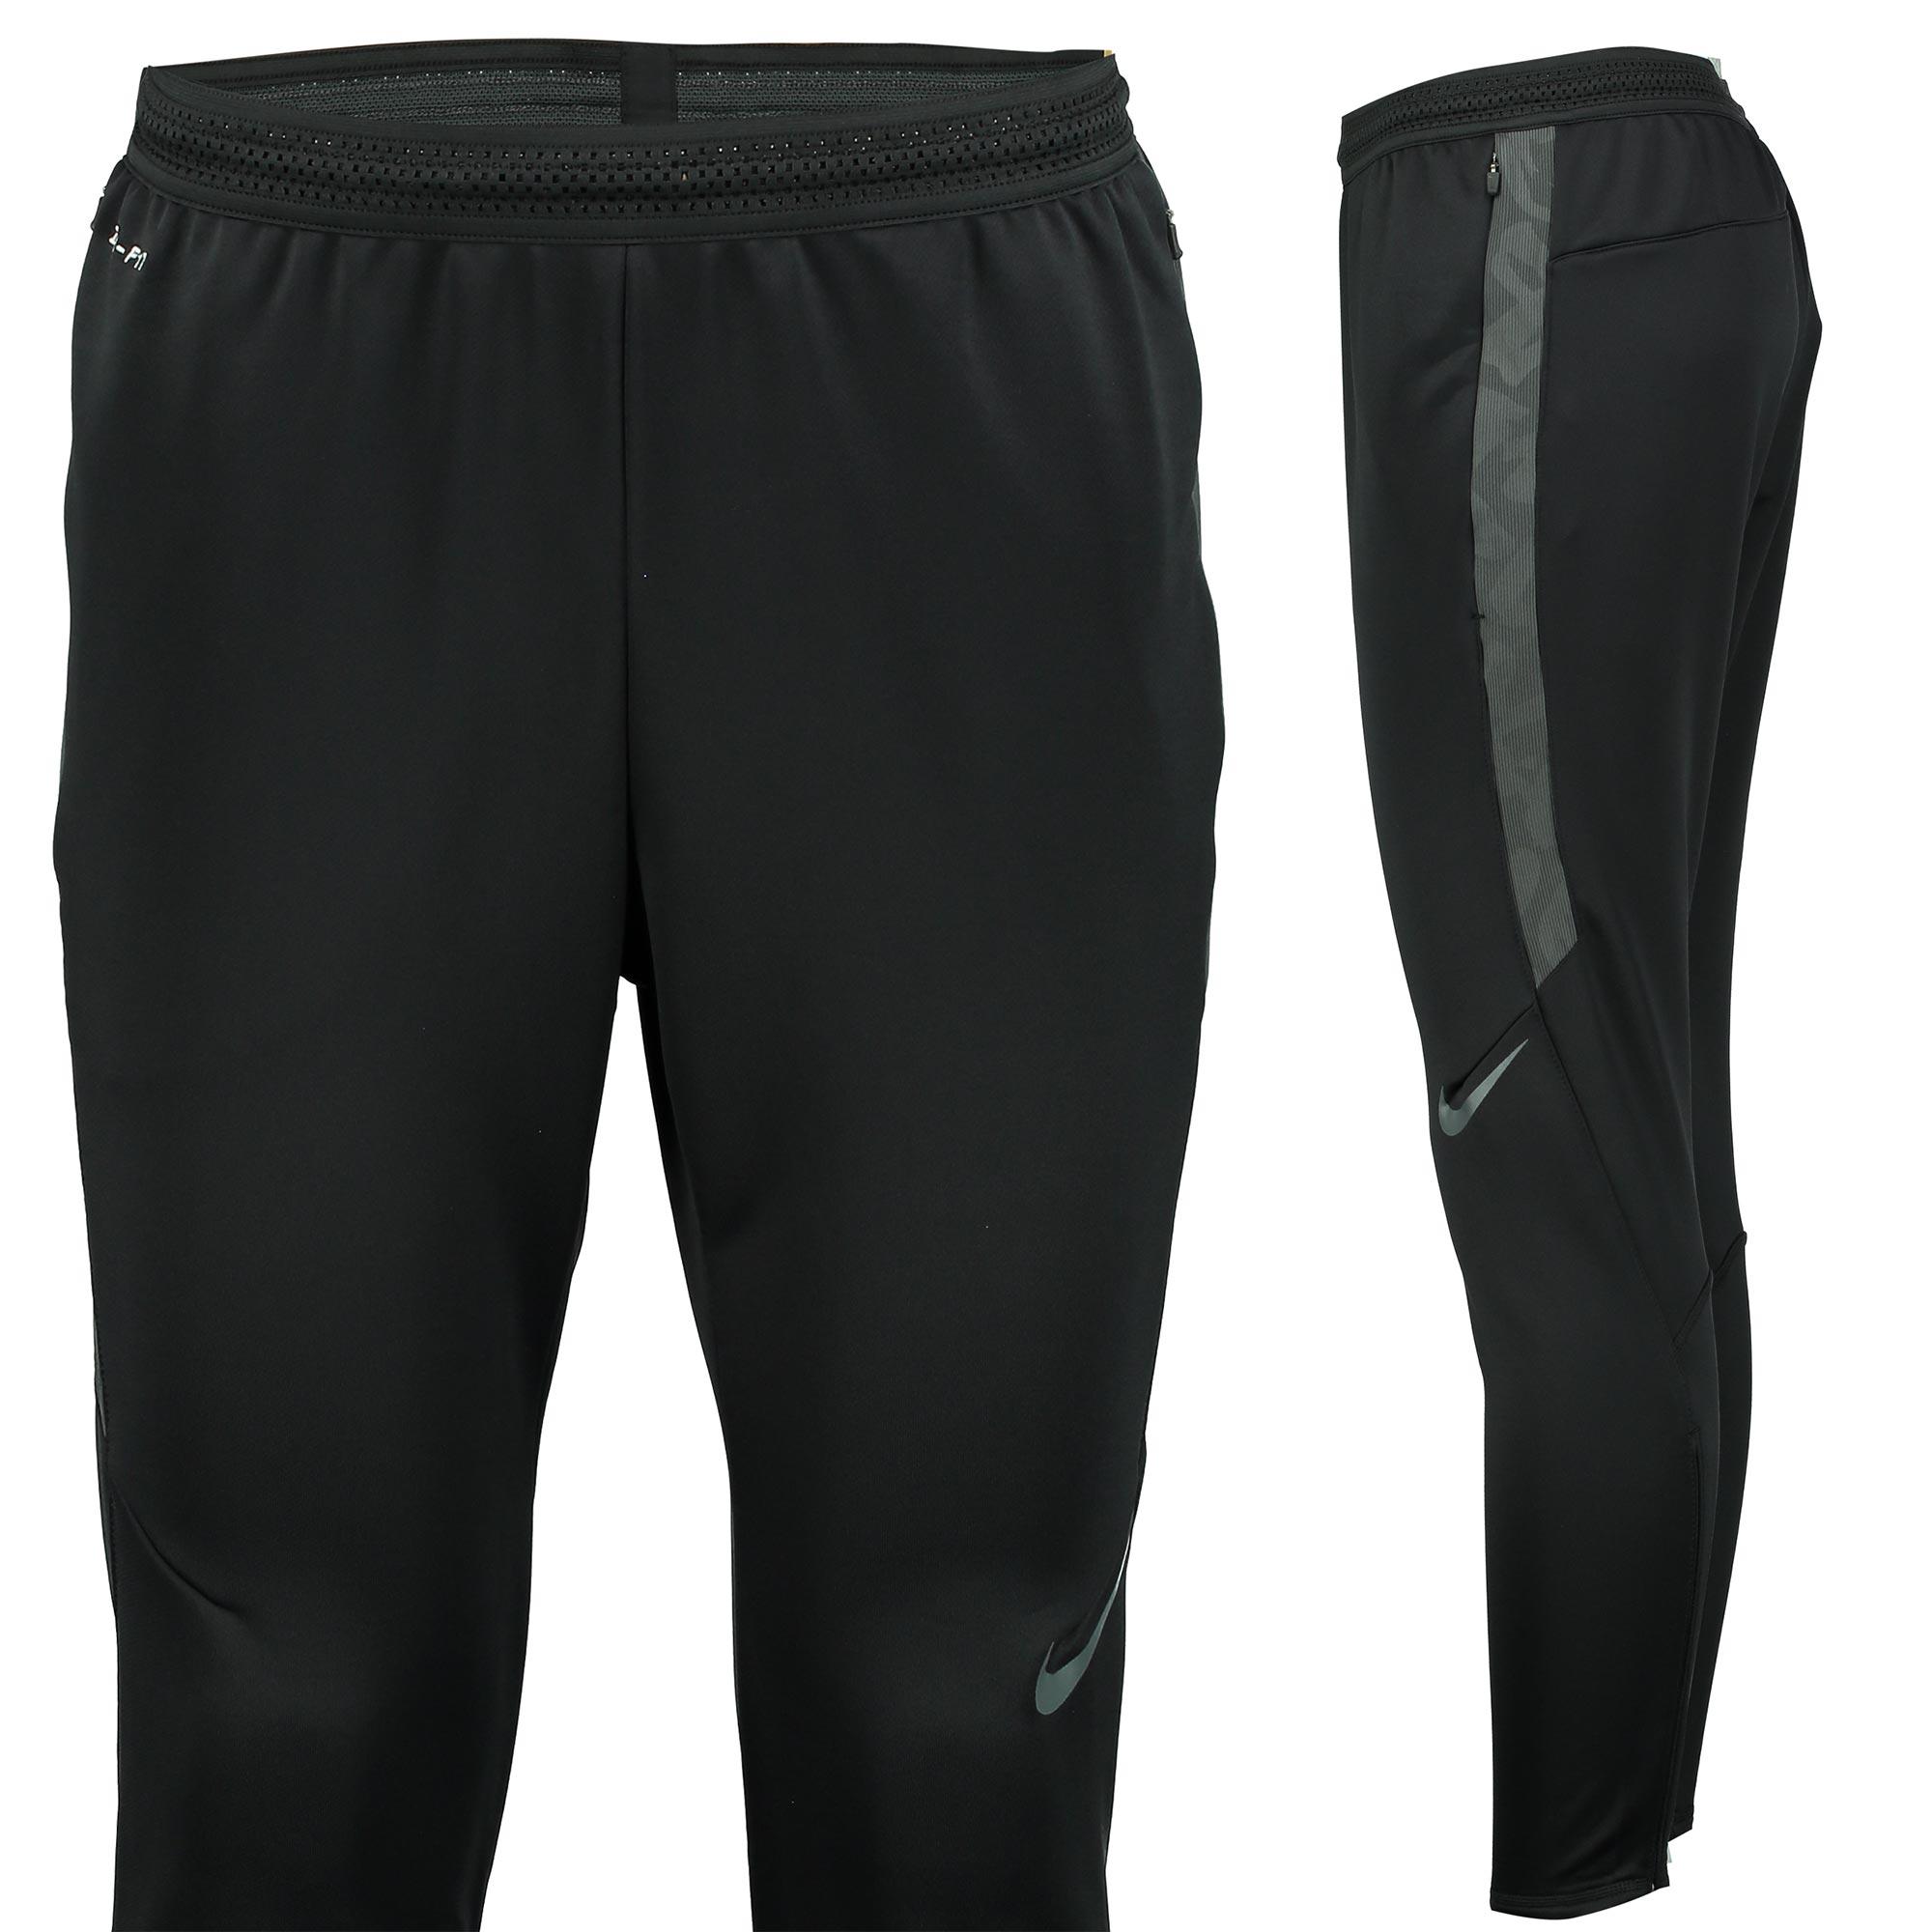 Nike Strike X Pants - Black/Black/Black/Anthracite